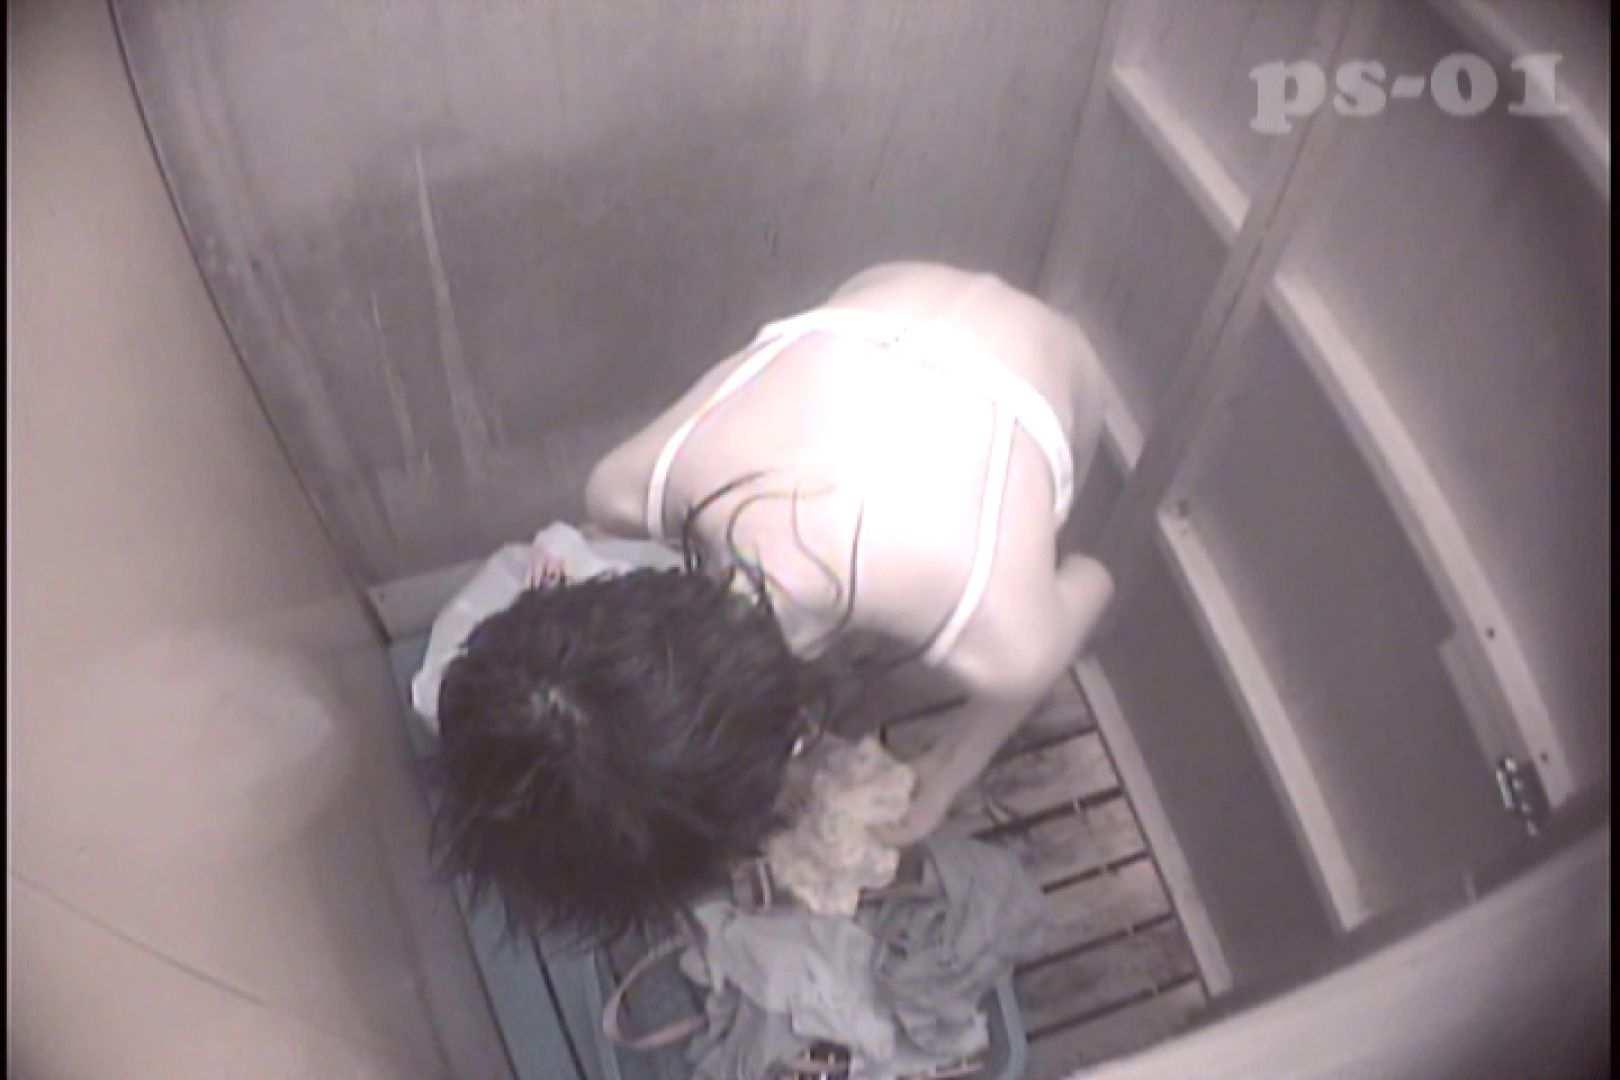 File.02 貧乳と下着がナイス! シャワー エロ画像 69画像 37